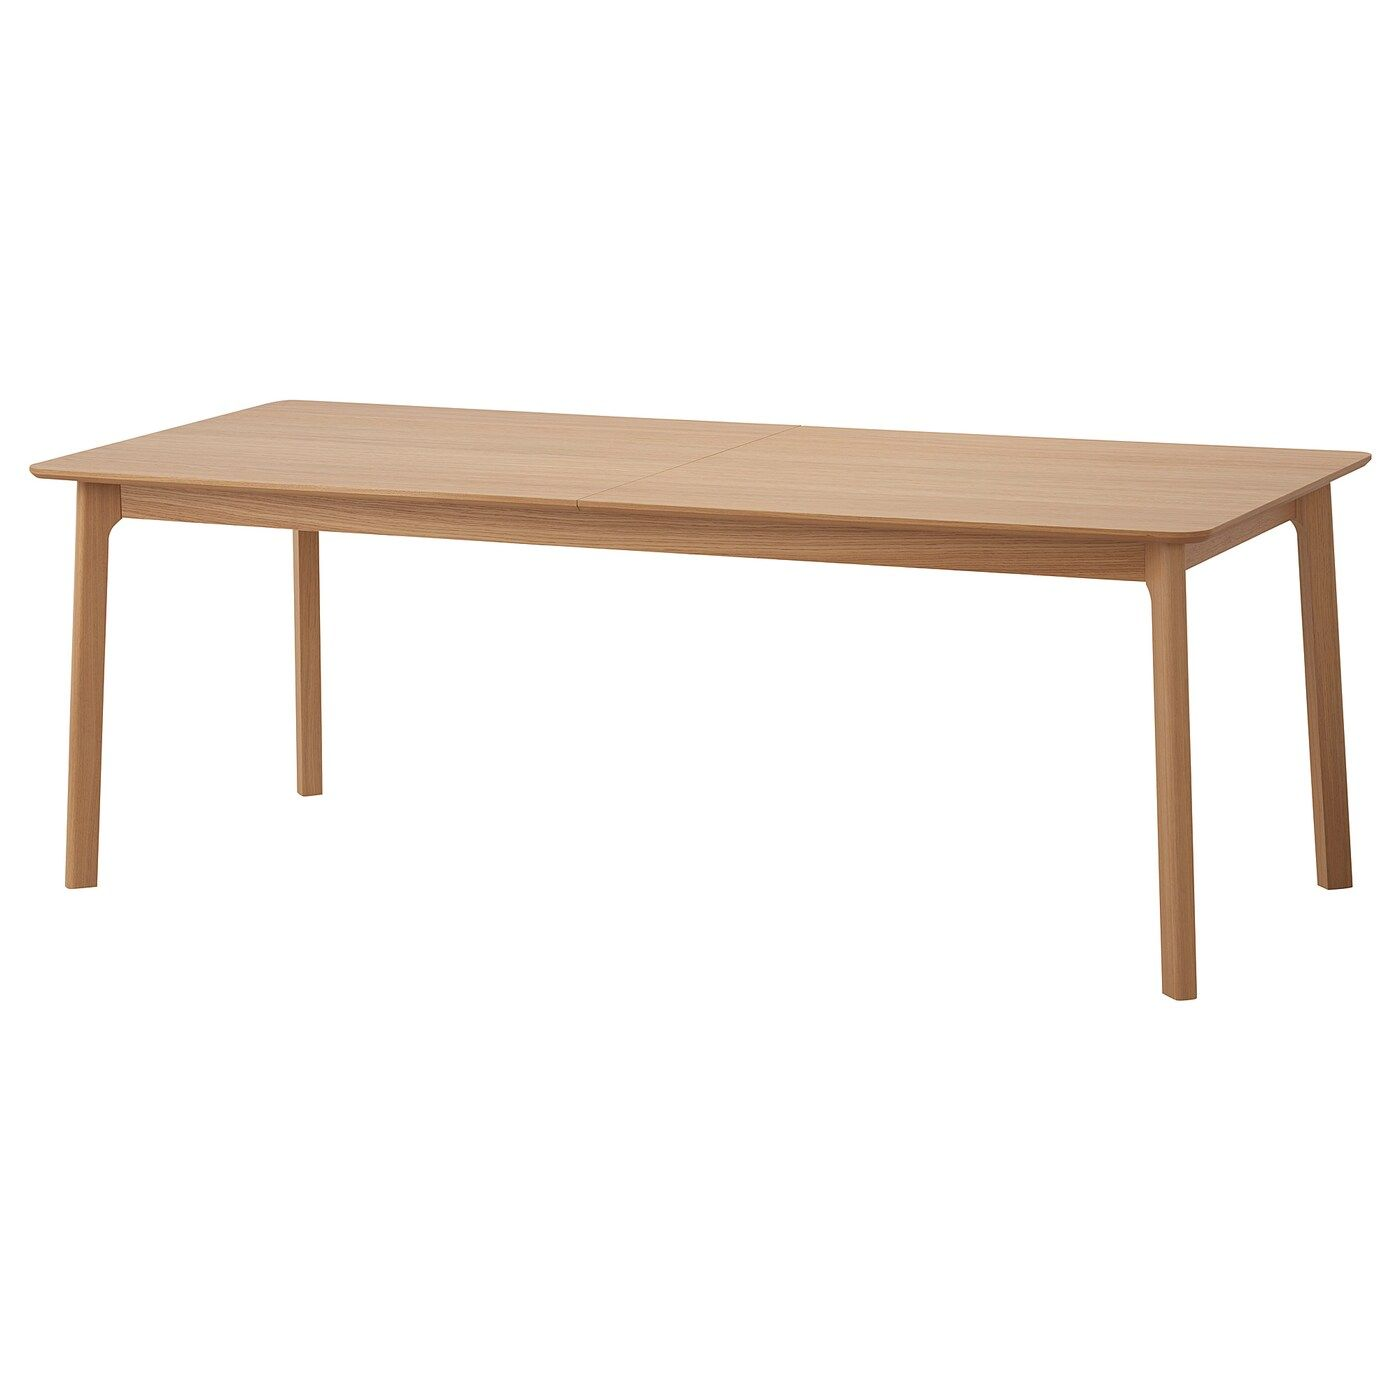 Mellansel Ausziehtisch Eichenfurnier 220x95x77 Cm Ikea Schweiz Ikea Table Ikea Table [ 1400 x 1400 Pixel ]